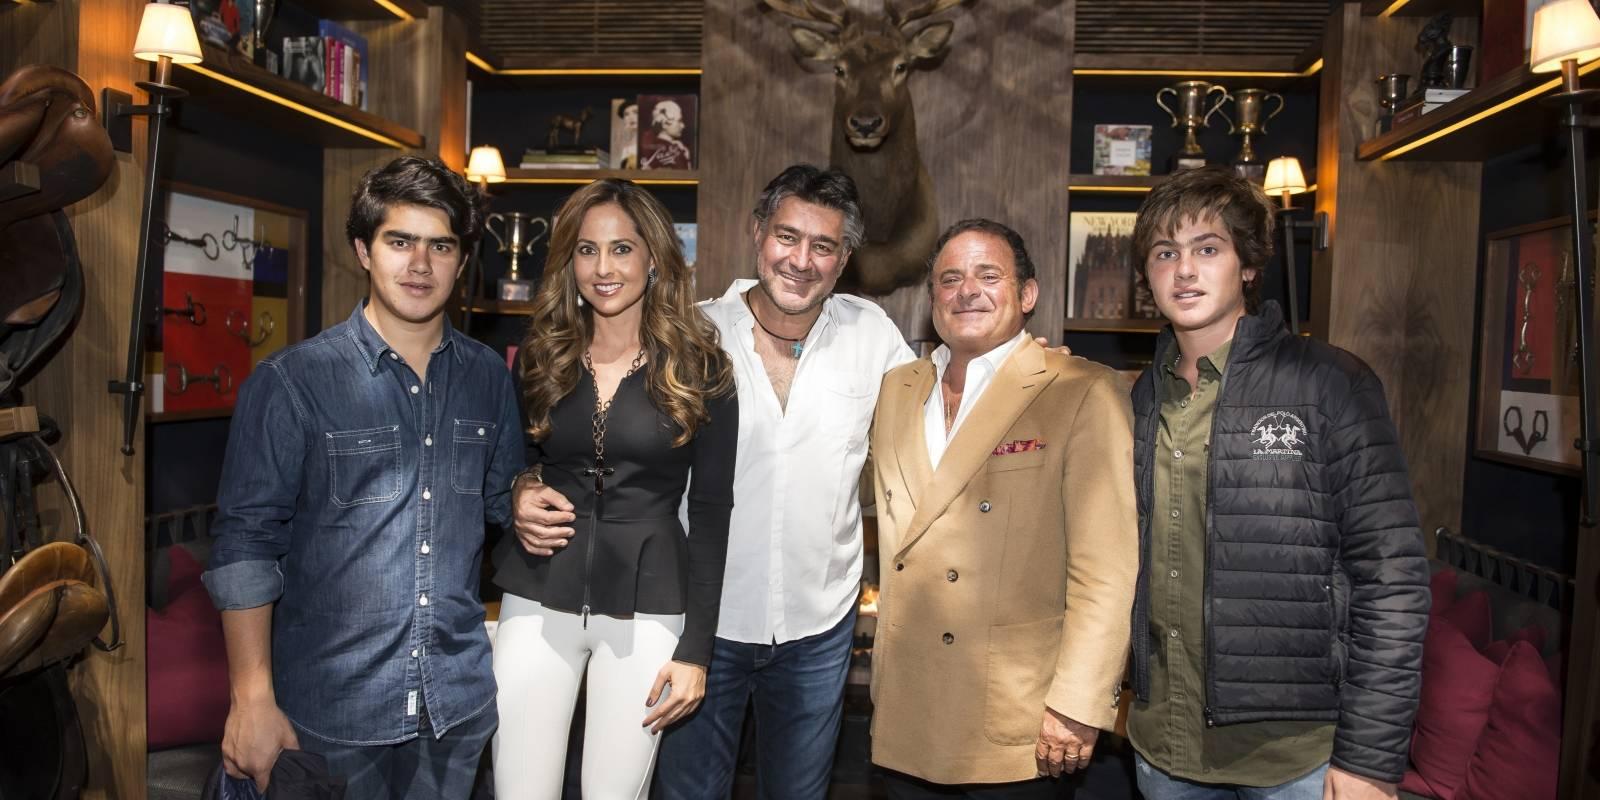 José Abraham Juan, Pepe Juan, Pepe Cuaik, Diego Juan y Yanin Juan JDS